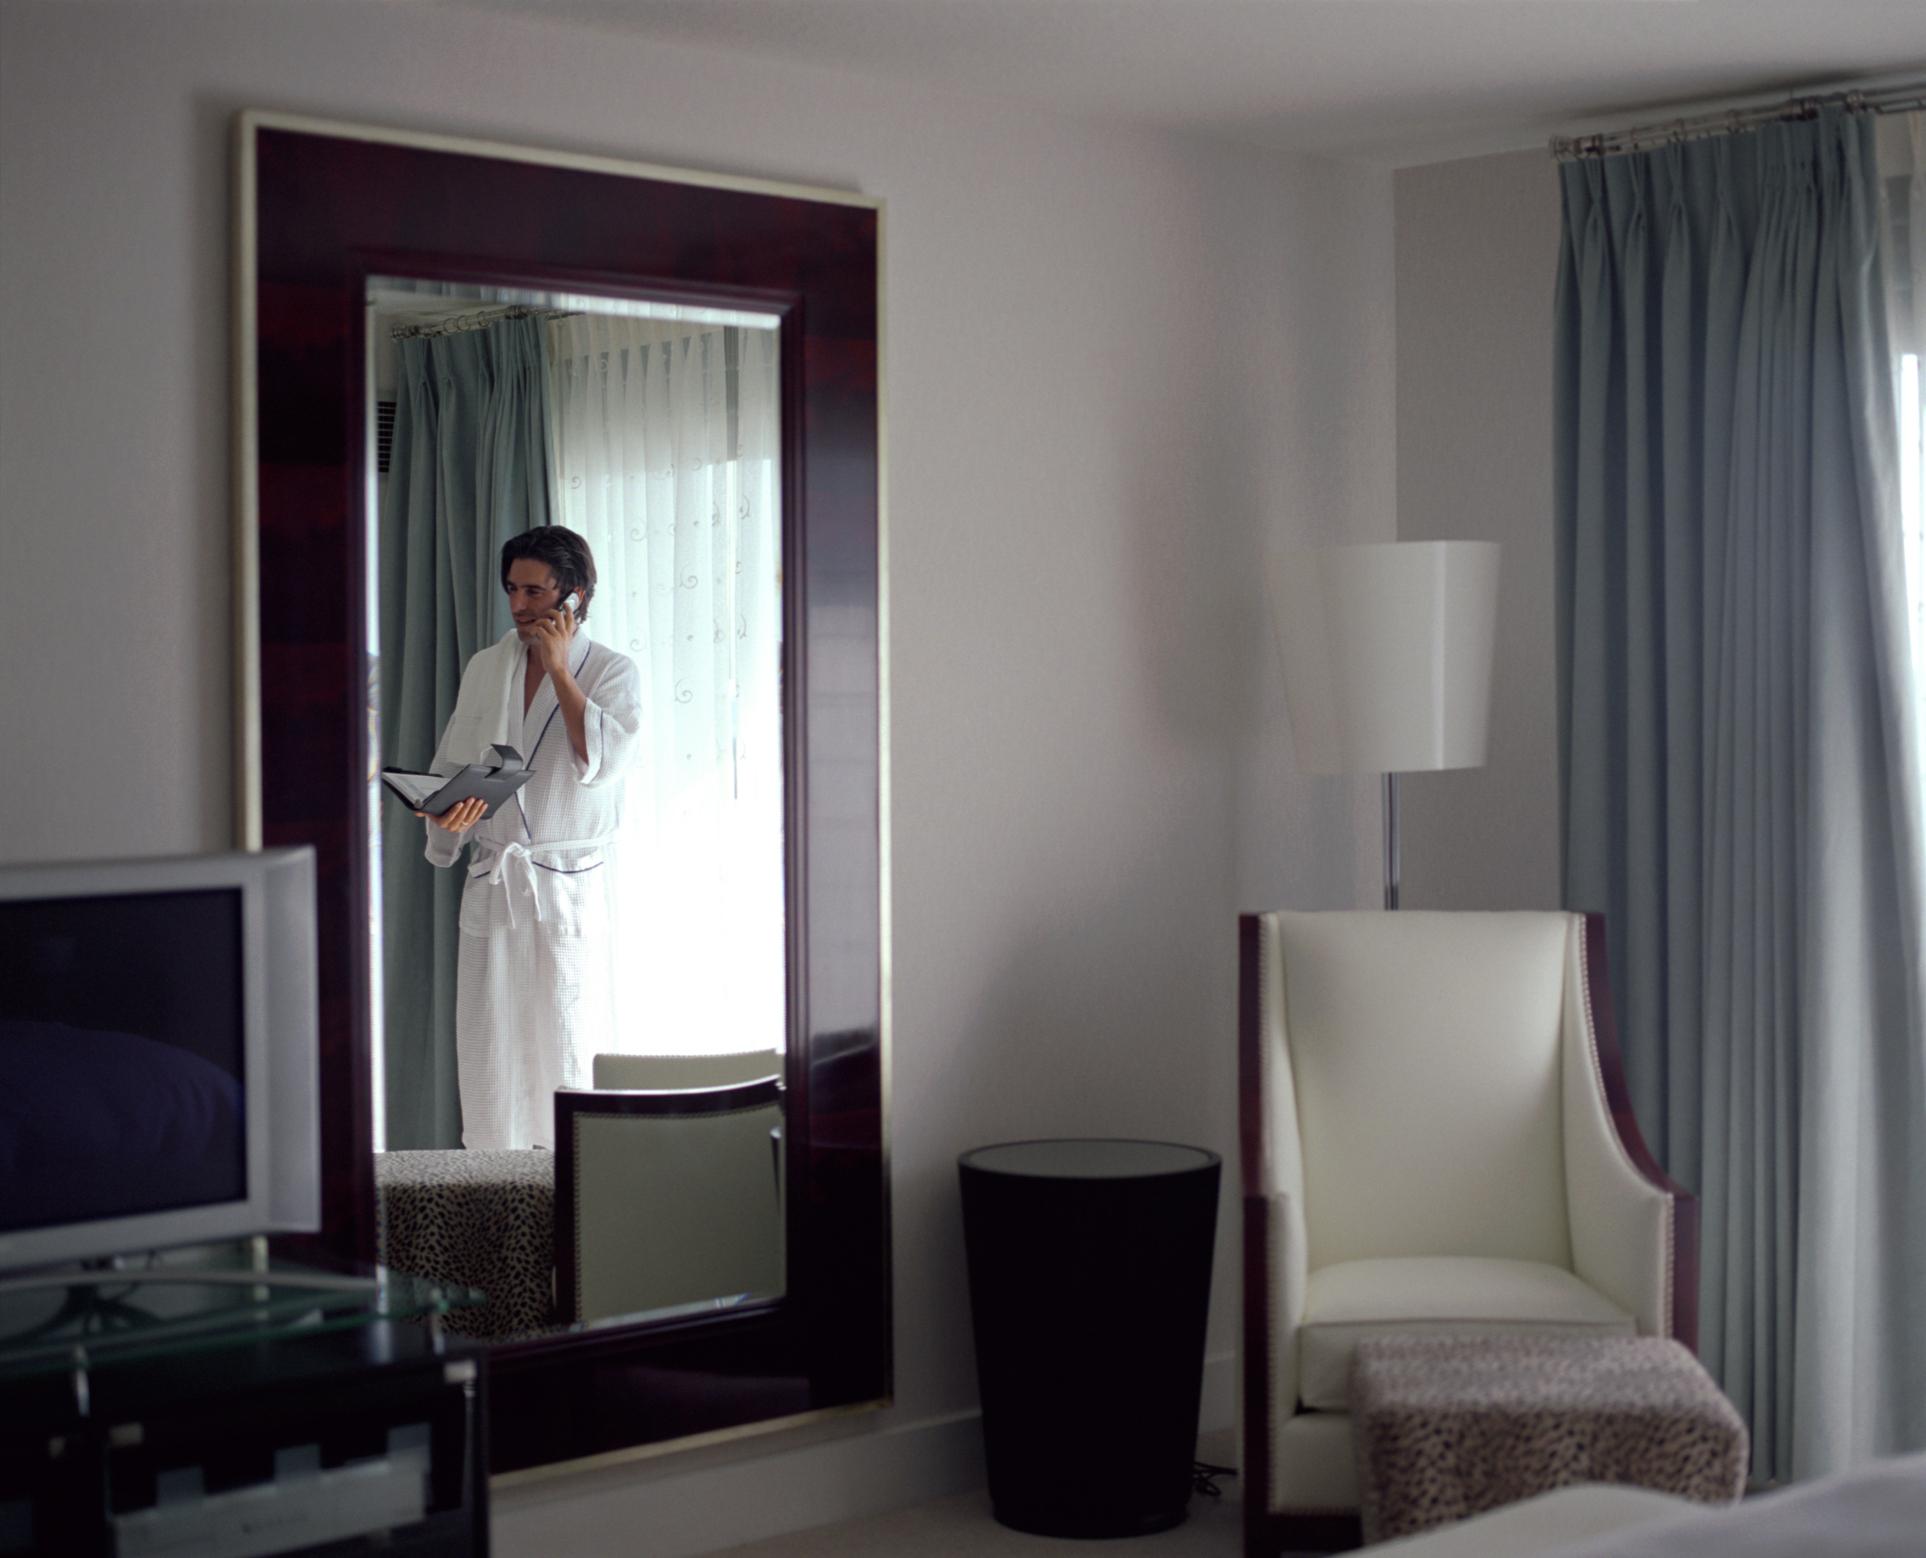 C mo colocar un televisor detr s de un espejo de dos v as - Como colocar un espejo encima de un aparador ...